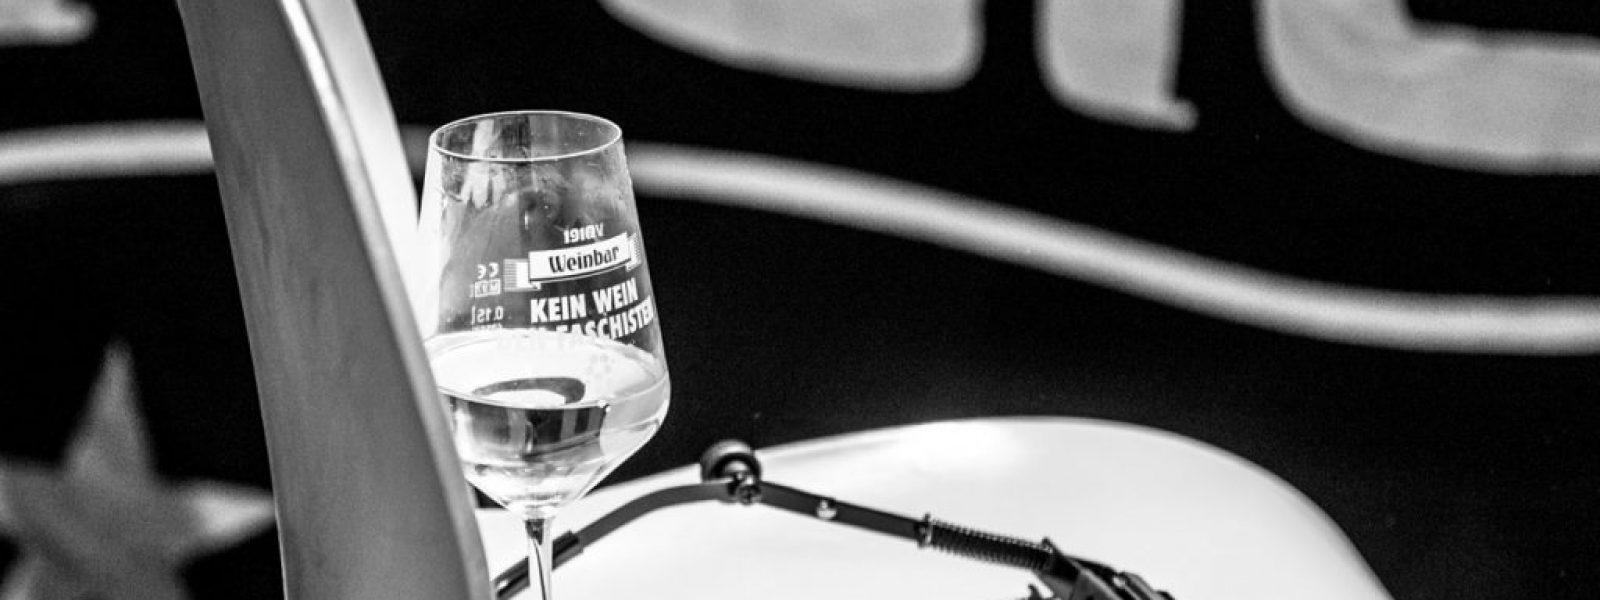 Weinfest gegen Rassismus (Fotos Sabrina Adeline Nagel) - 88